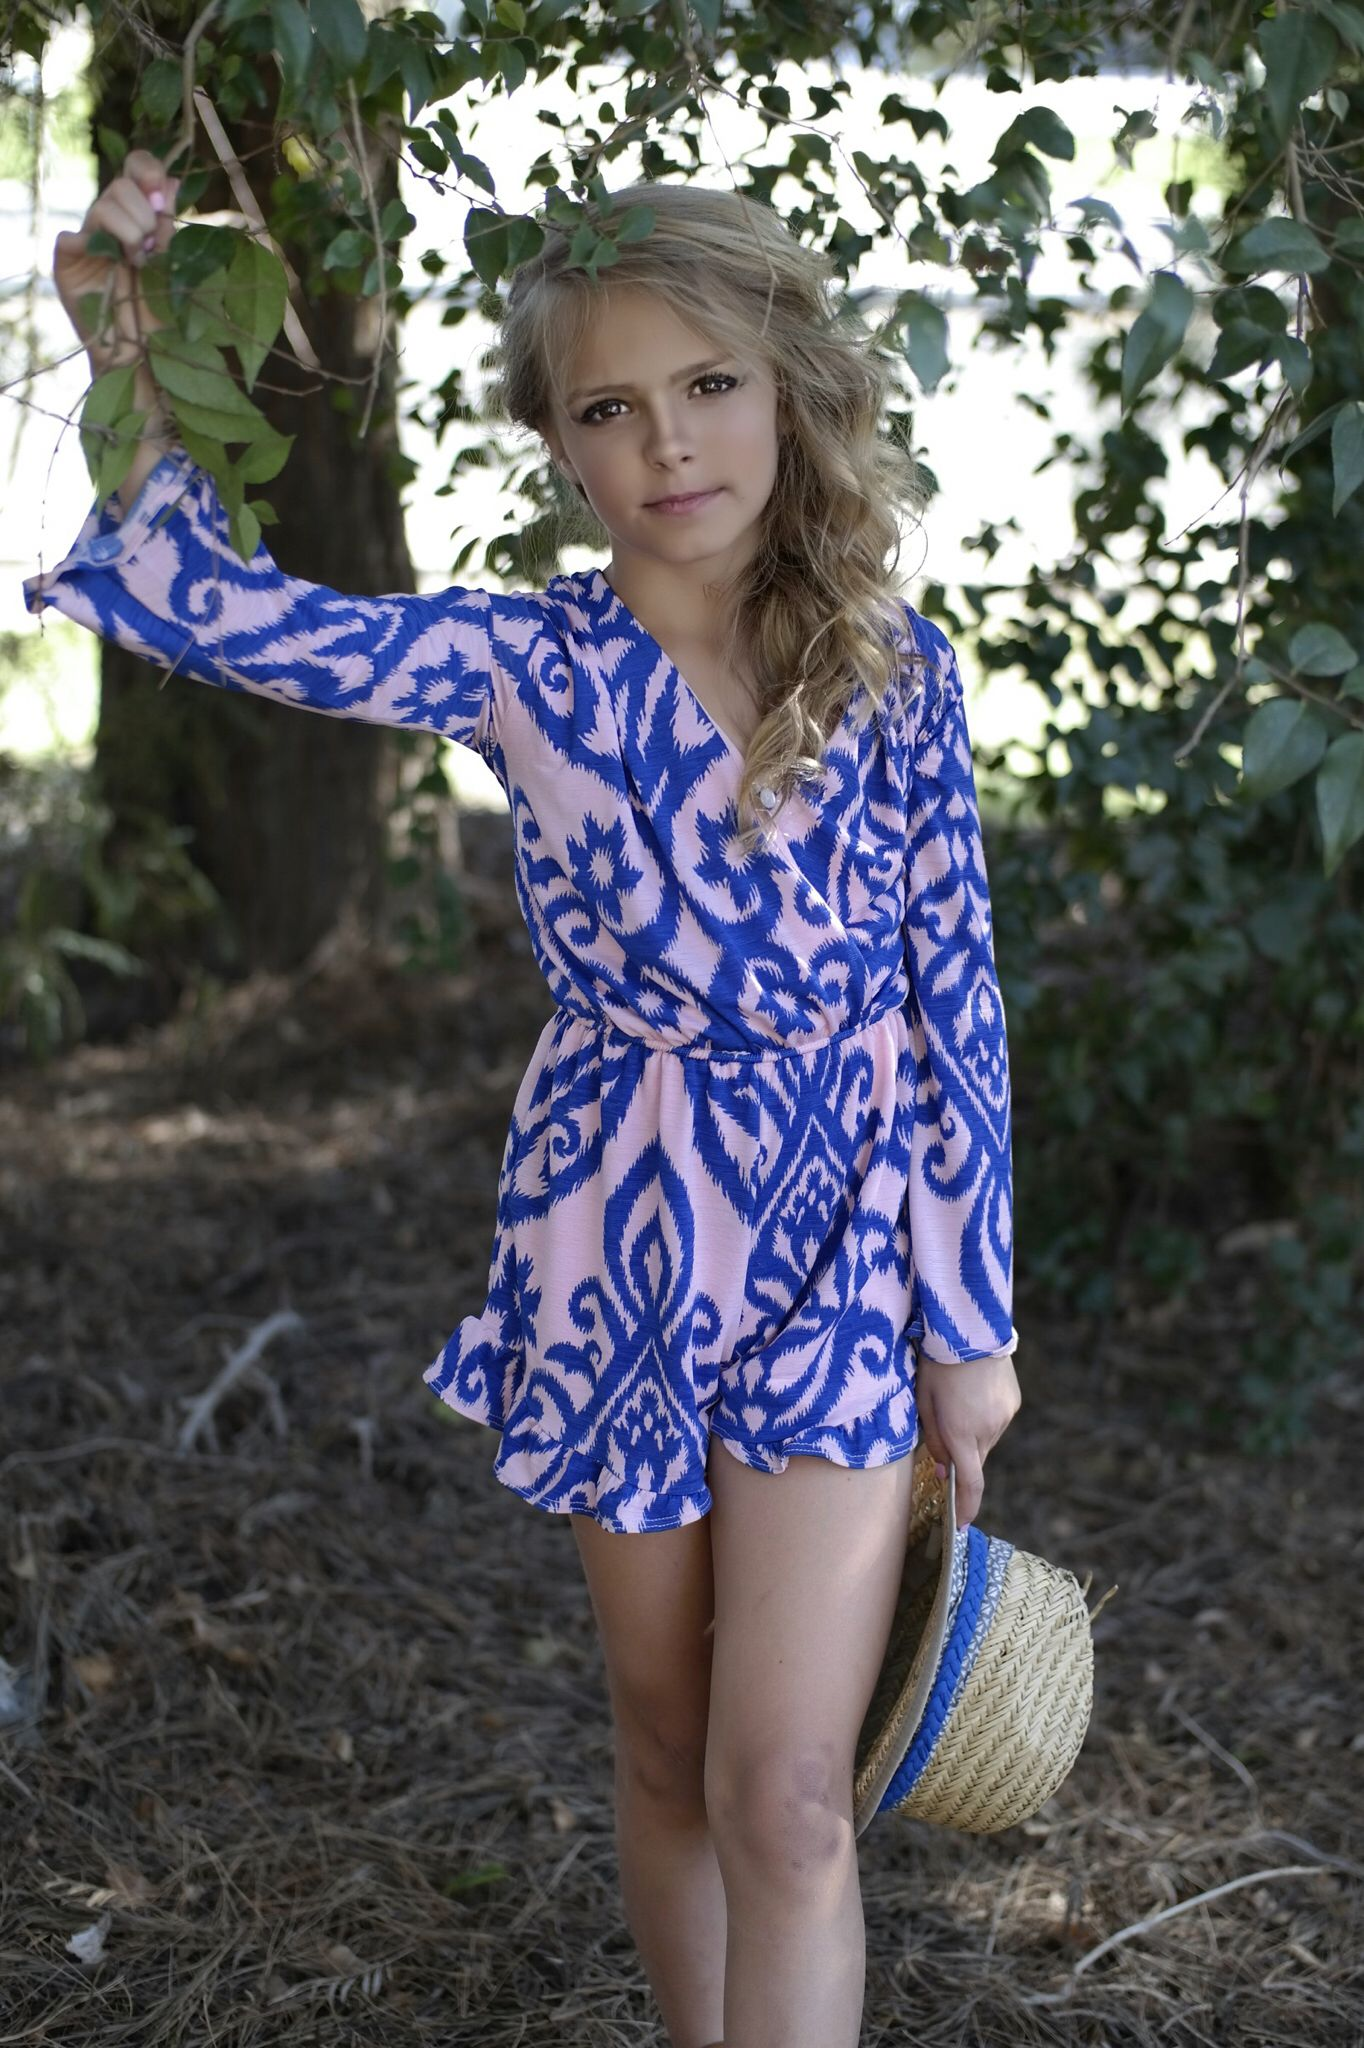 Img 7863 Fancy Spring Fashion Pinterest Girls